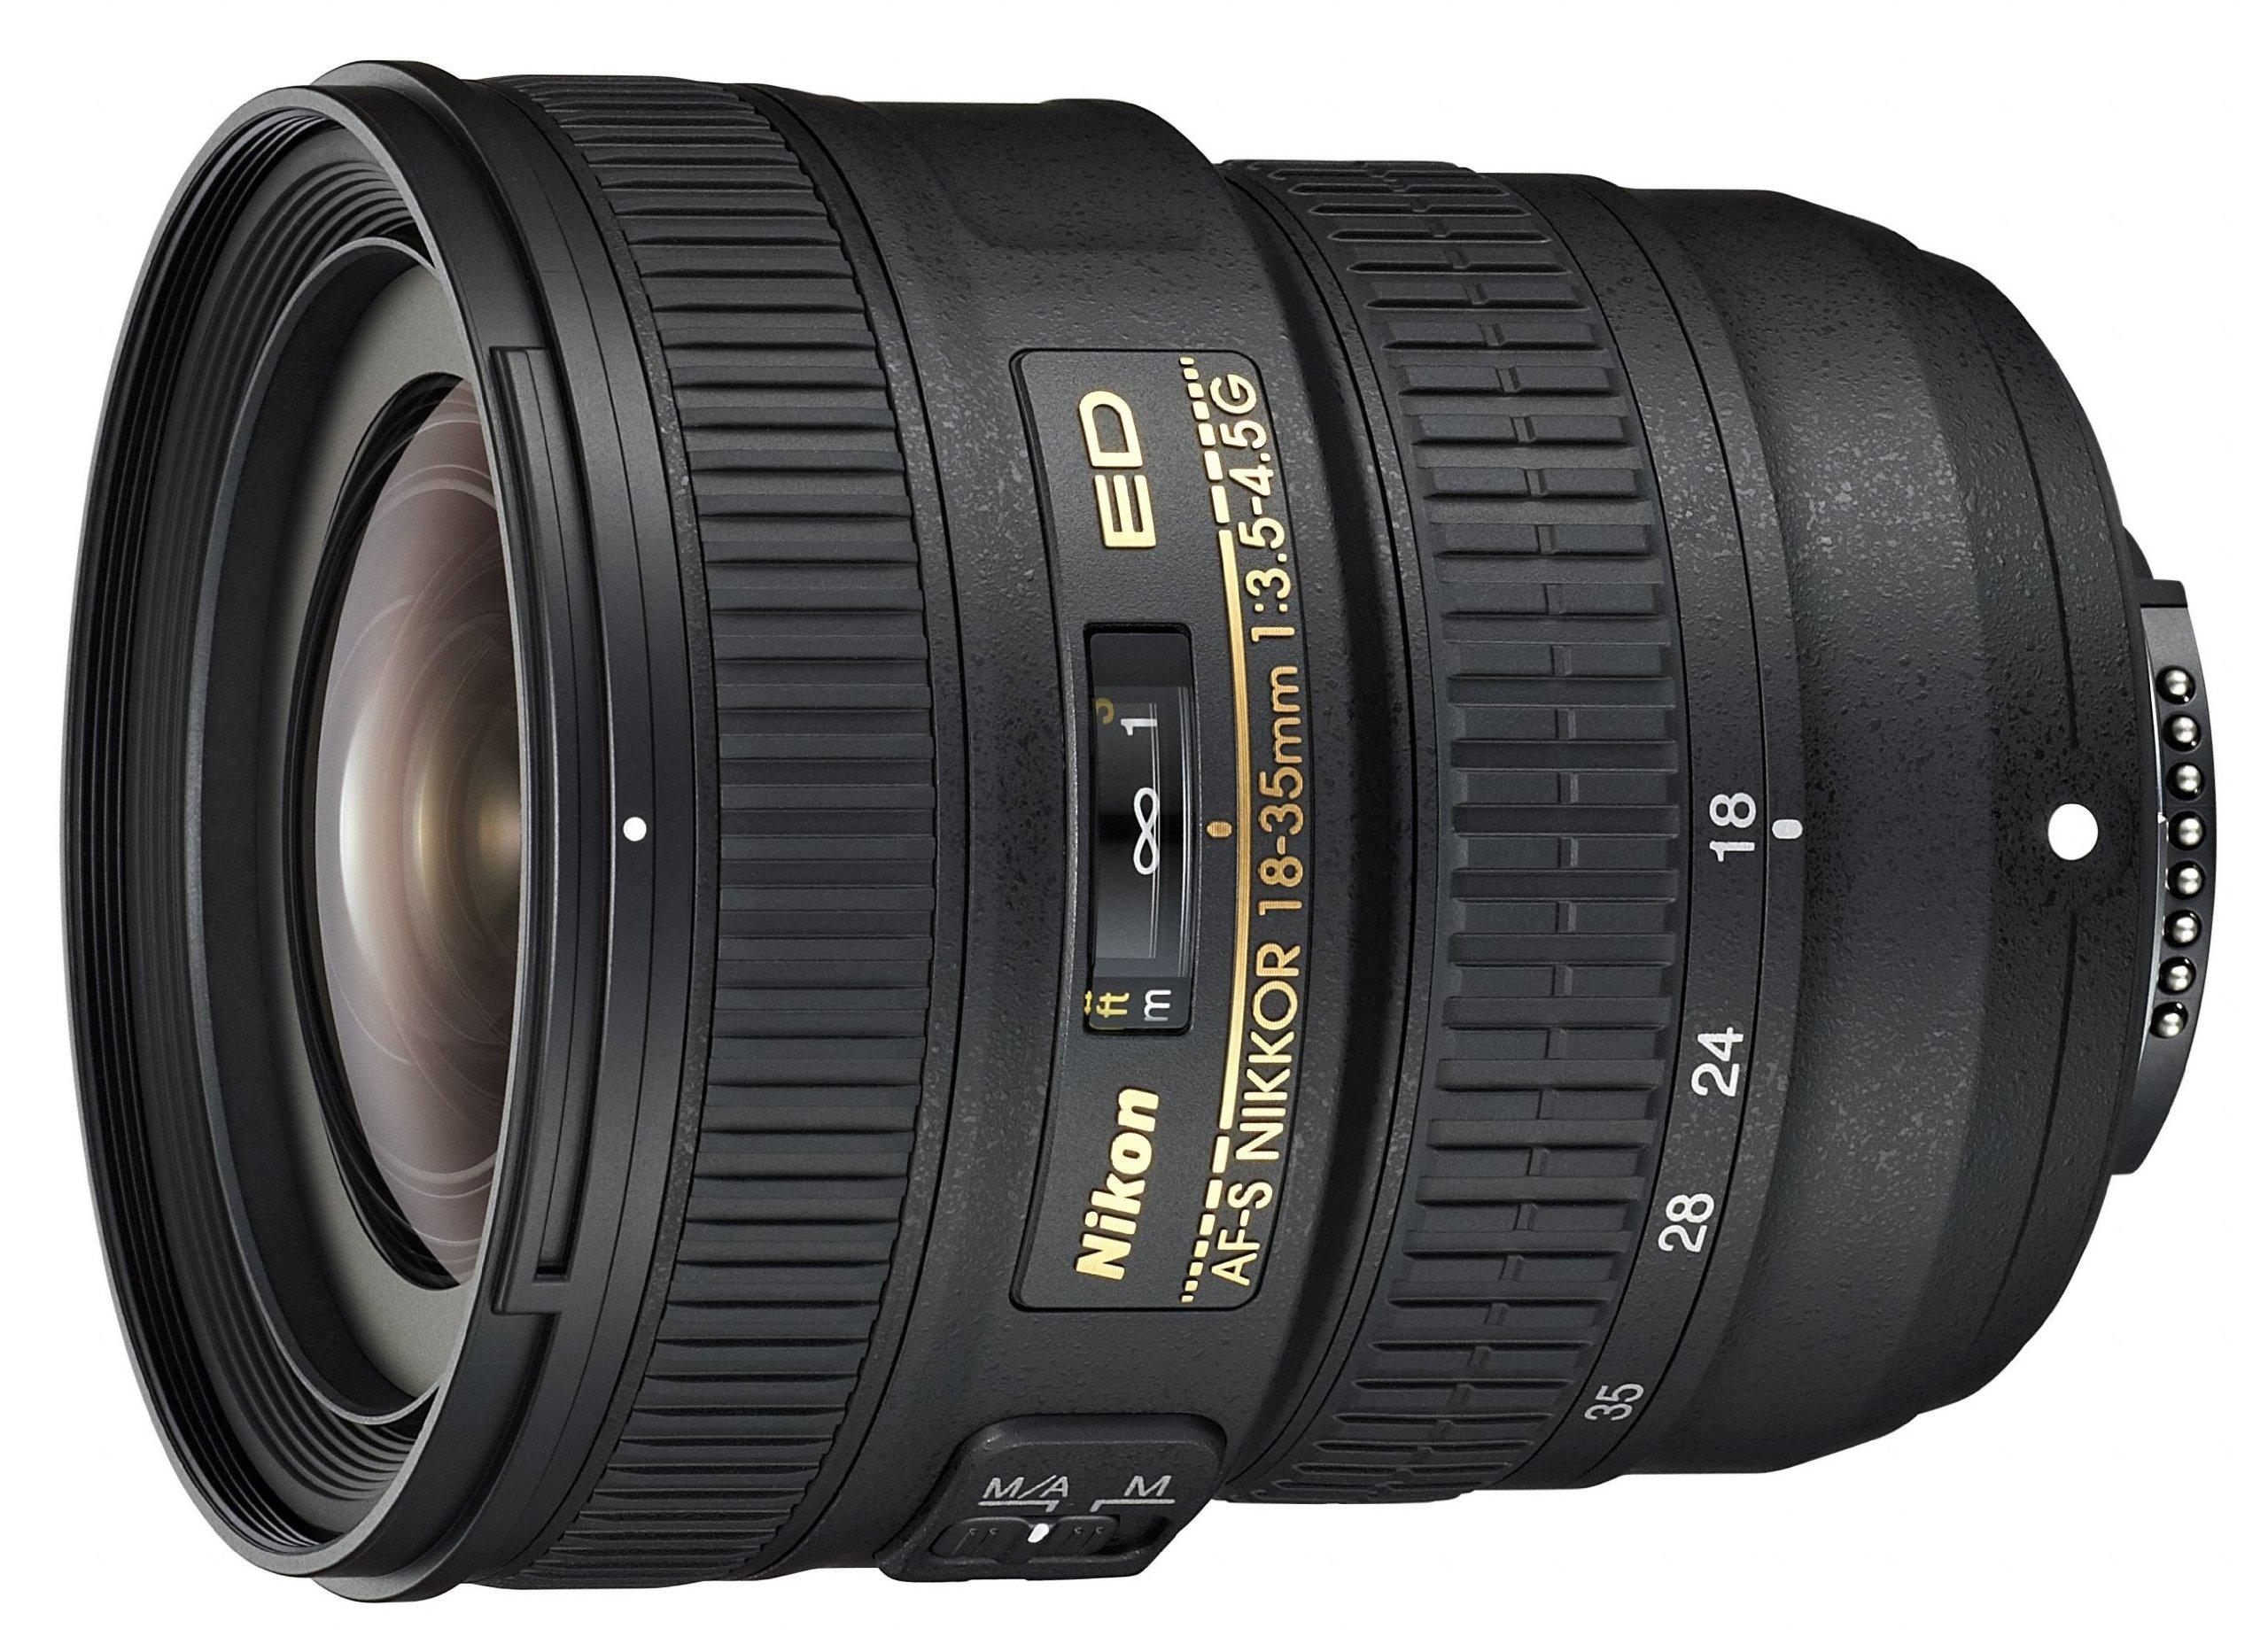 Nikon Obiettivo Nikkor AF-S 18-35 mm f/3.5-4.5G ED, Nero [Versione EU]